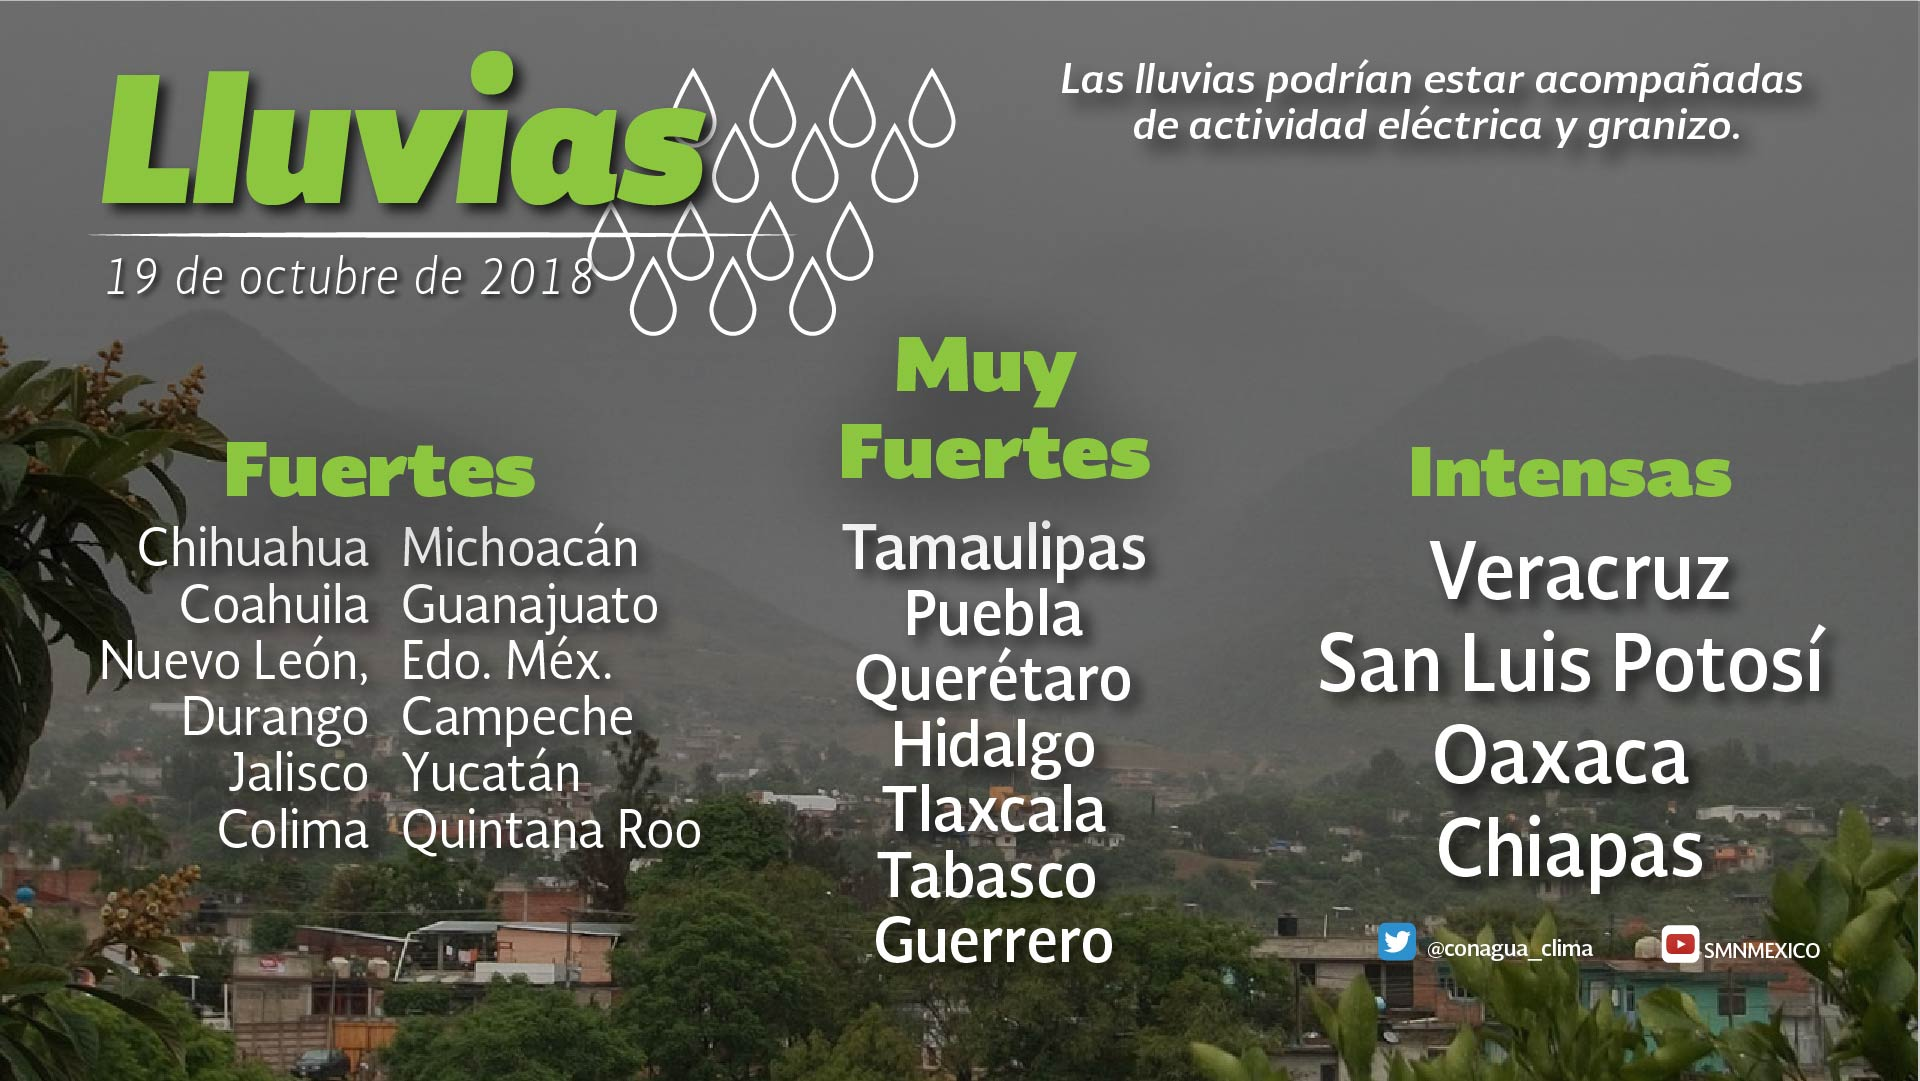 Se prevén tormentas muy fuertes para Tlaxcala